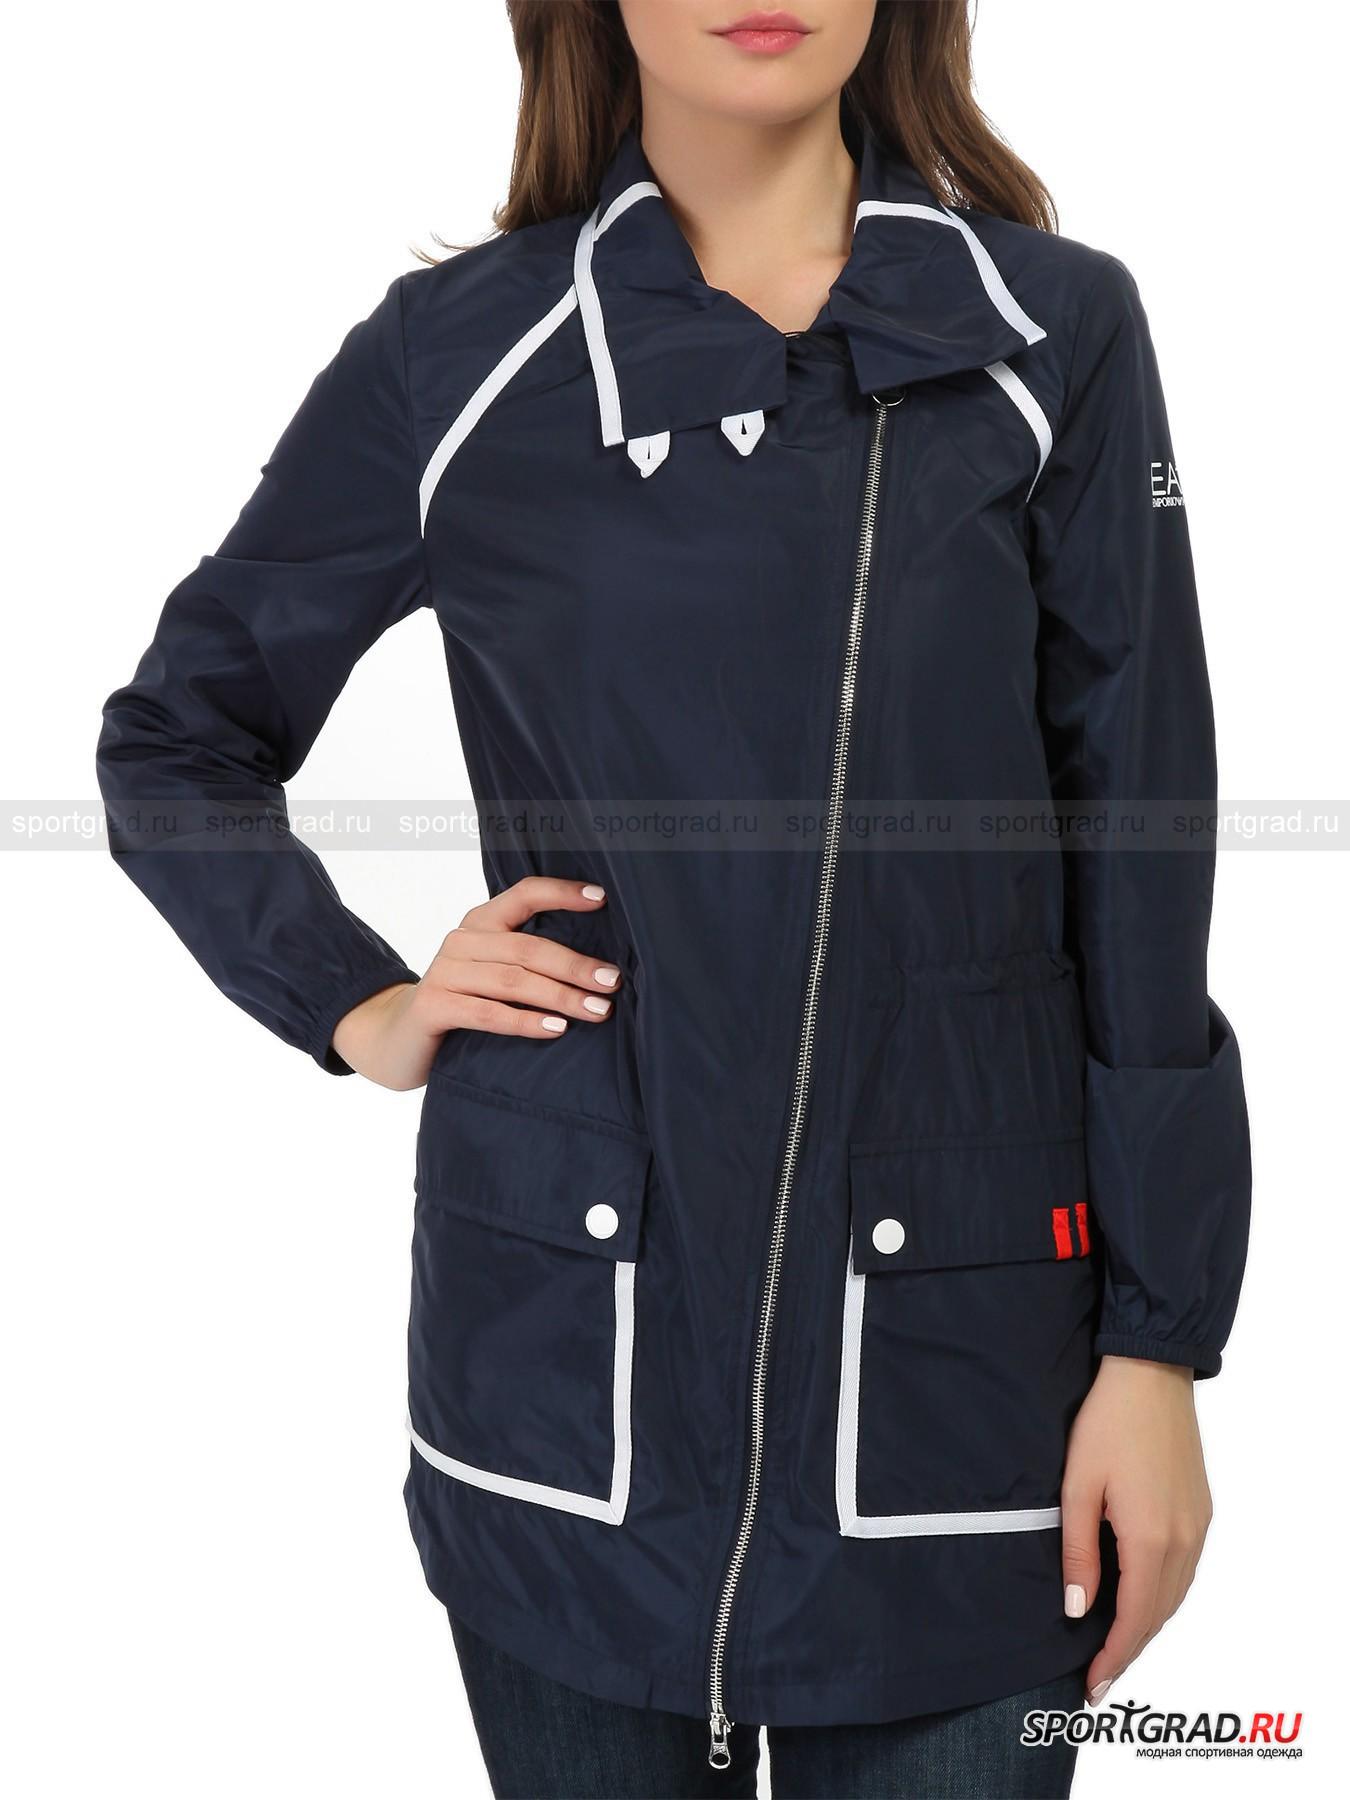 ������-���� ������� Sea World Cannes Long Jacket EA7 Emporio Armani